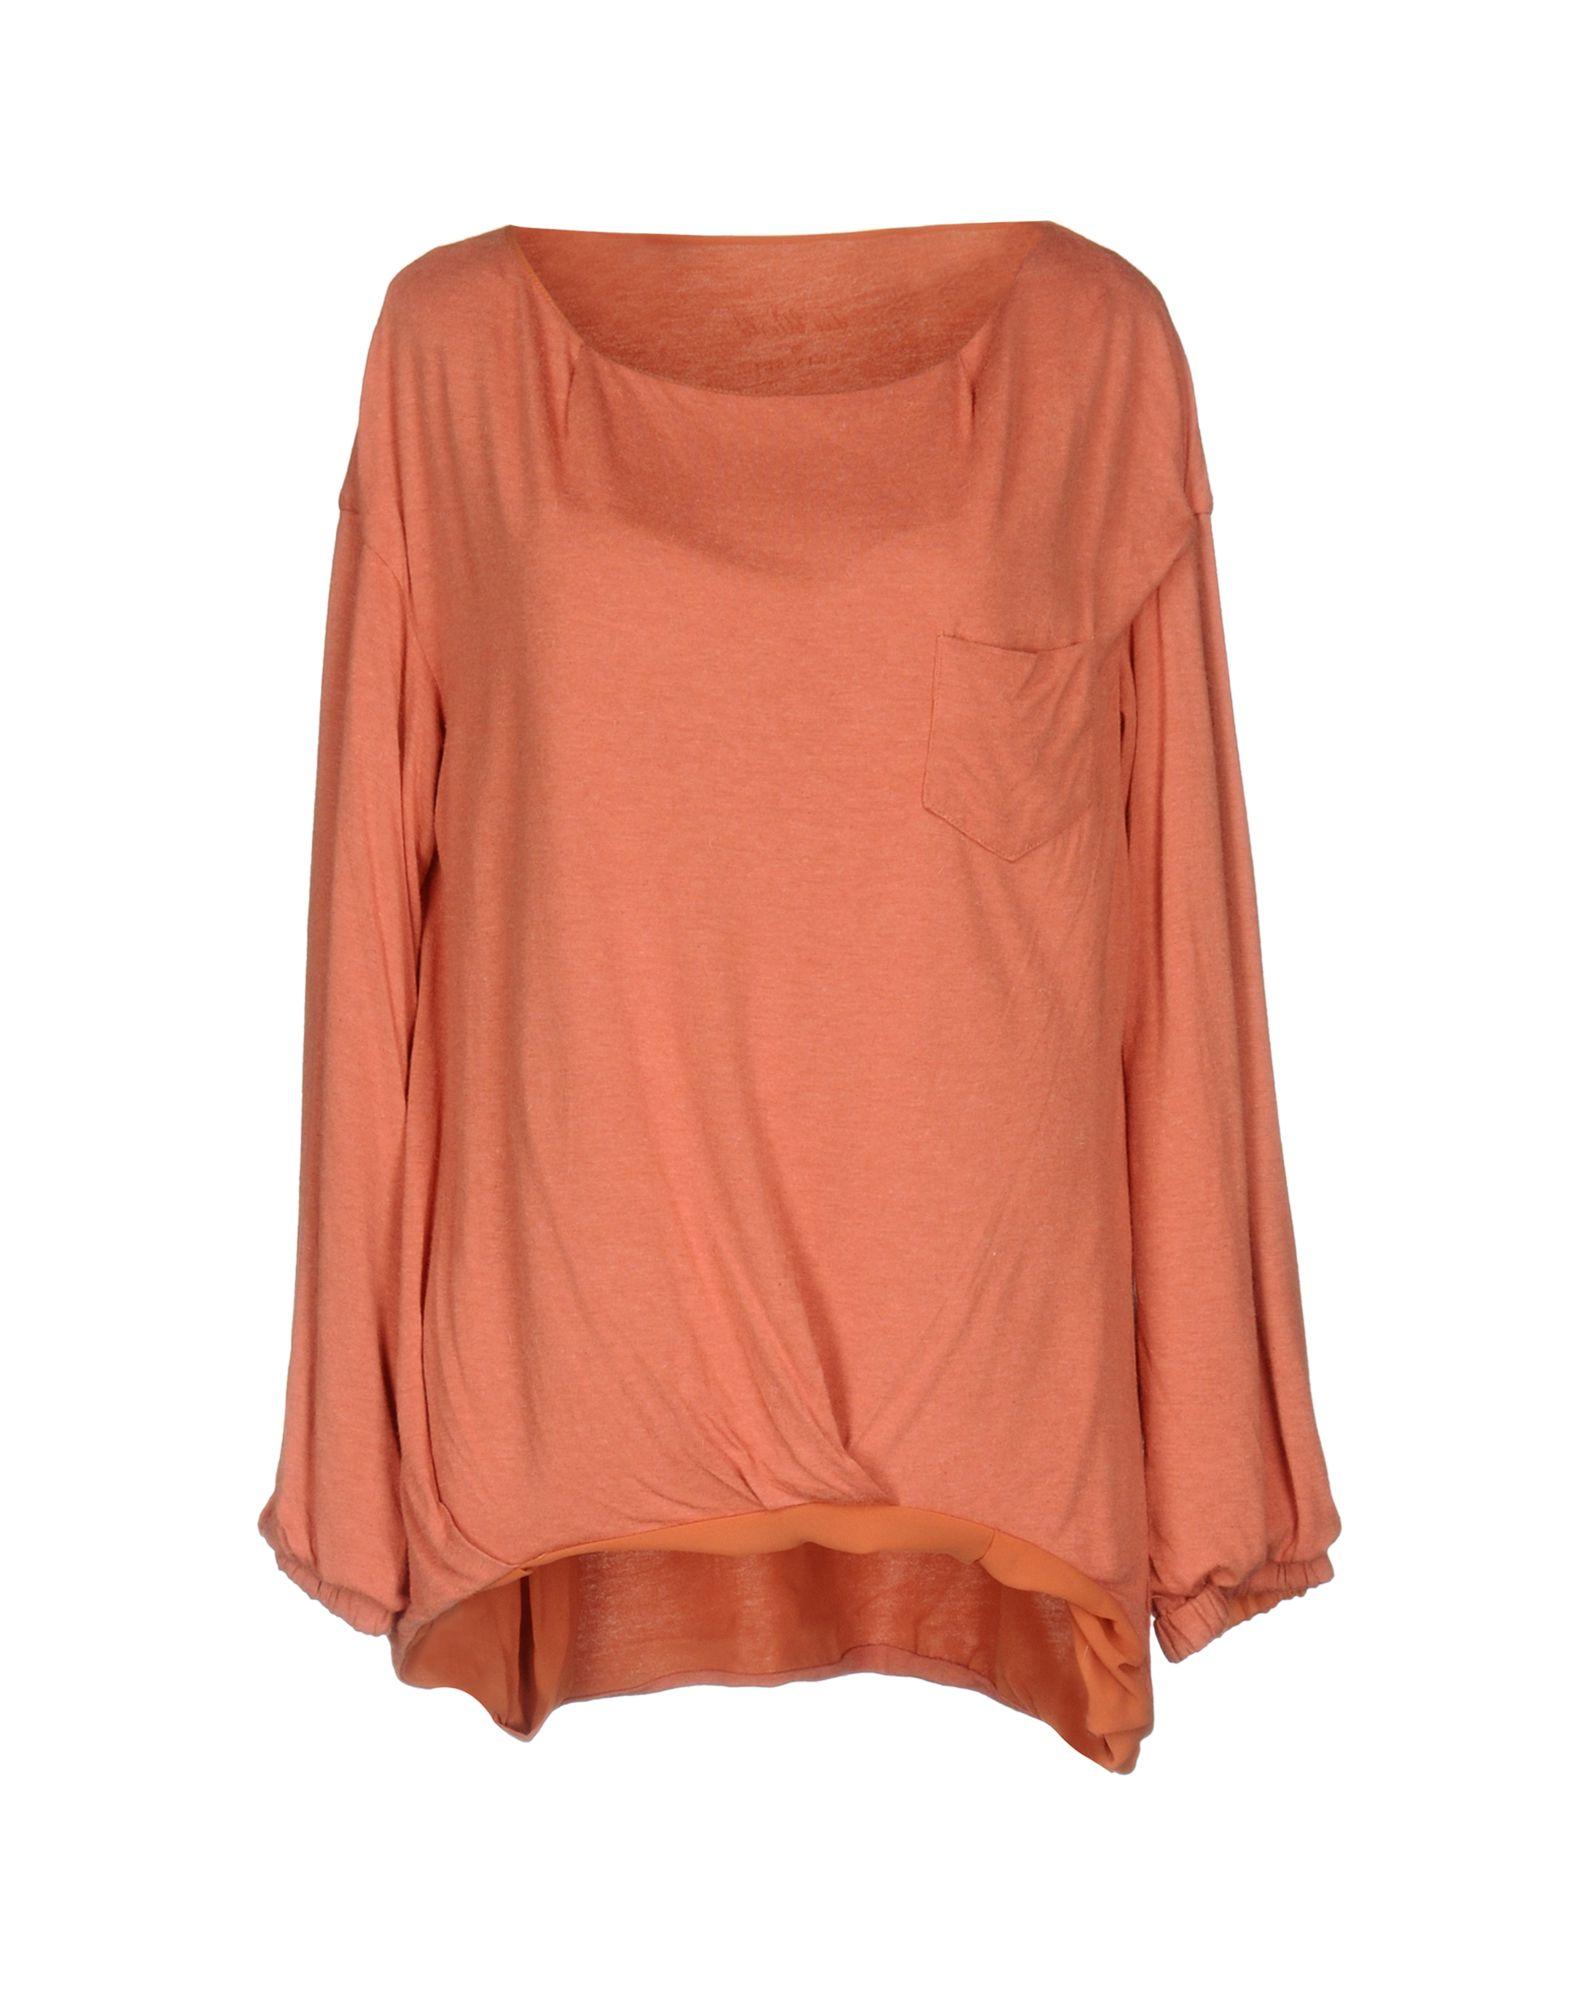 TWIN-SET Simona Barbieri Damen T-shirts Farbe Altrosa Größe 4 jetztbilligerkaufen